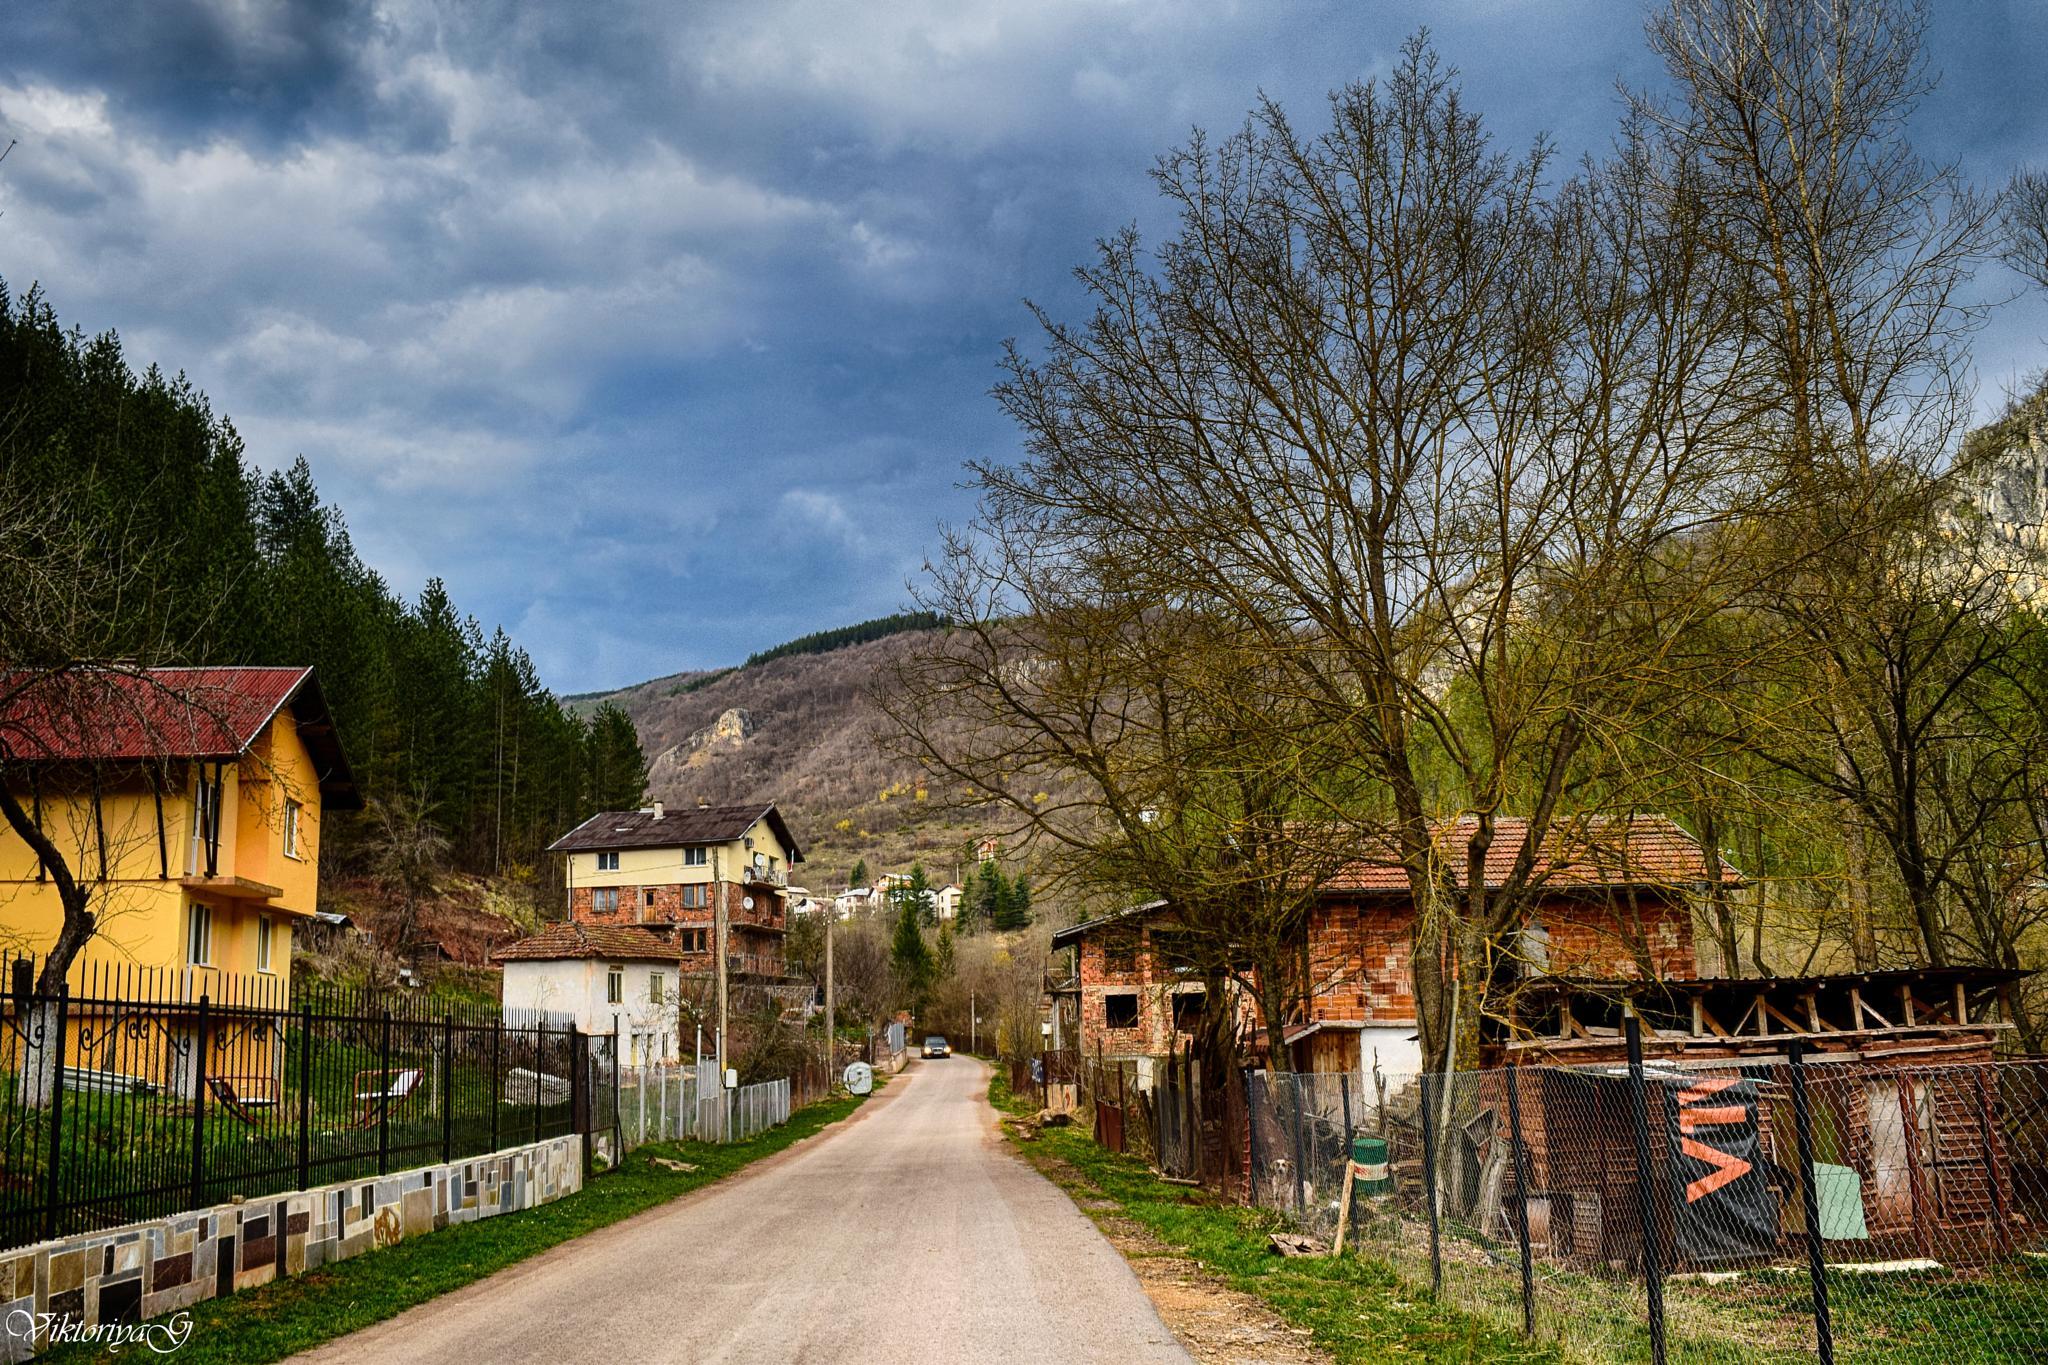 Bulgarian village by Viktoriya Georgieva